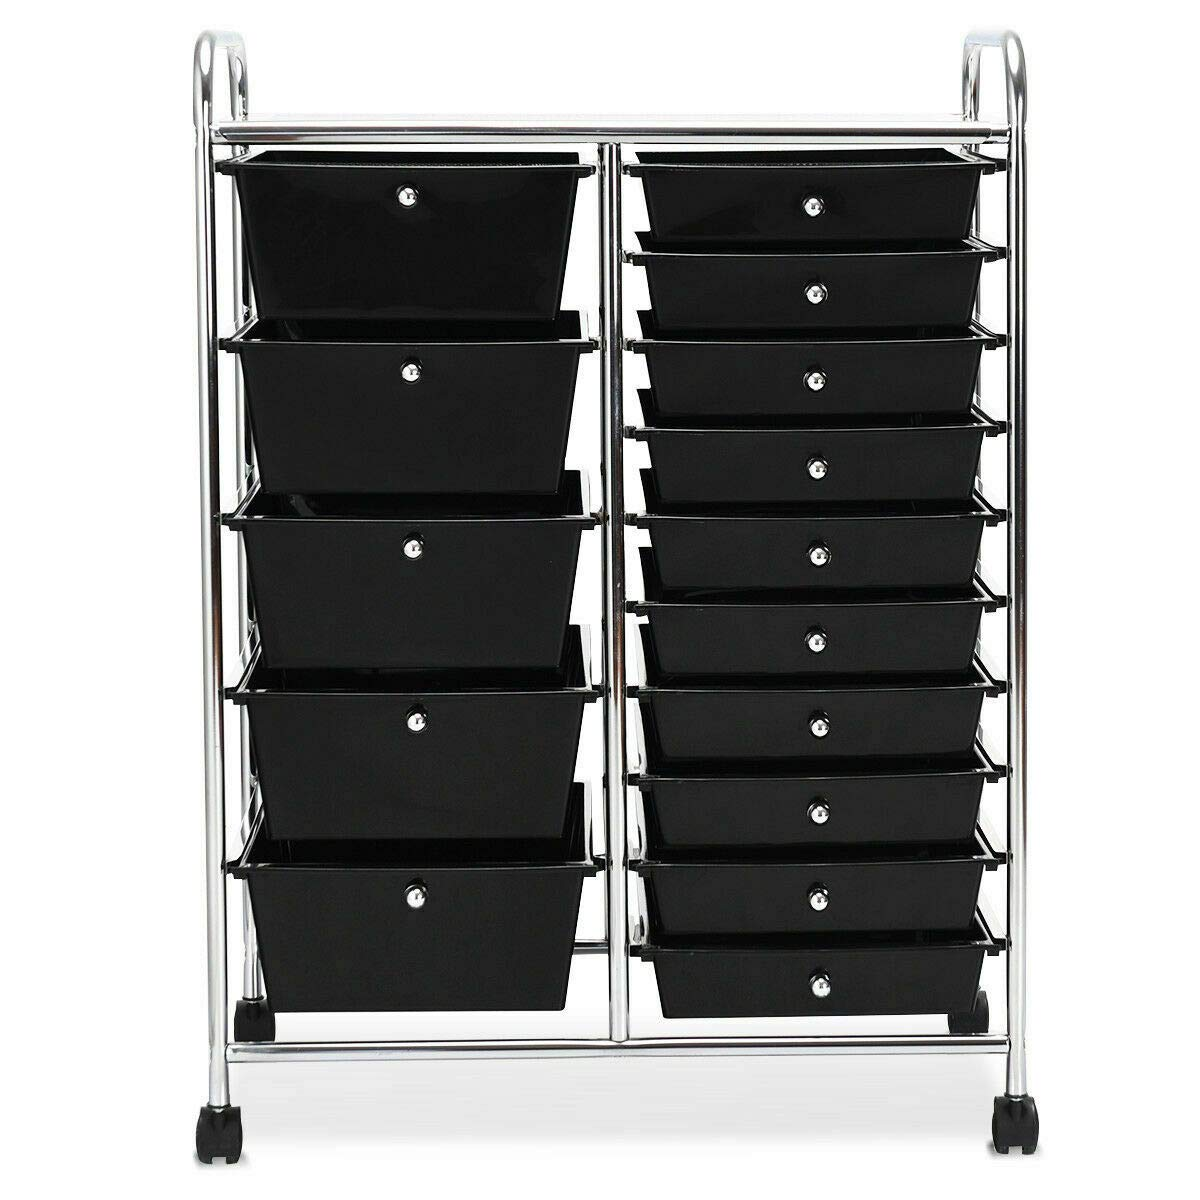 Heize best price Black Rolling Storage Cart 15 Drawer Organizer Cart Utility Storage Tools Scrapbook Paper Multi-Use Office Trolley(U.S. Stock)